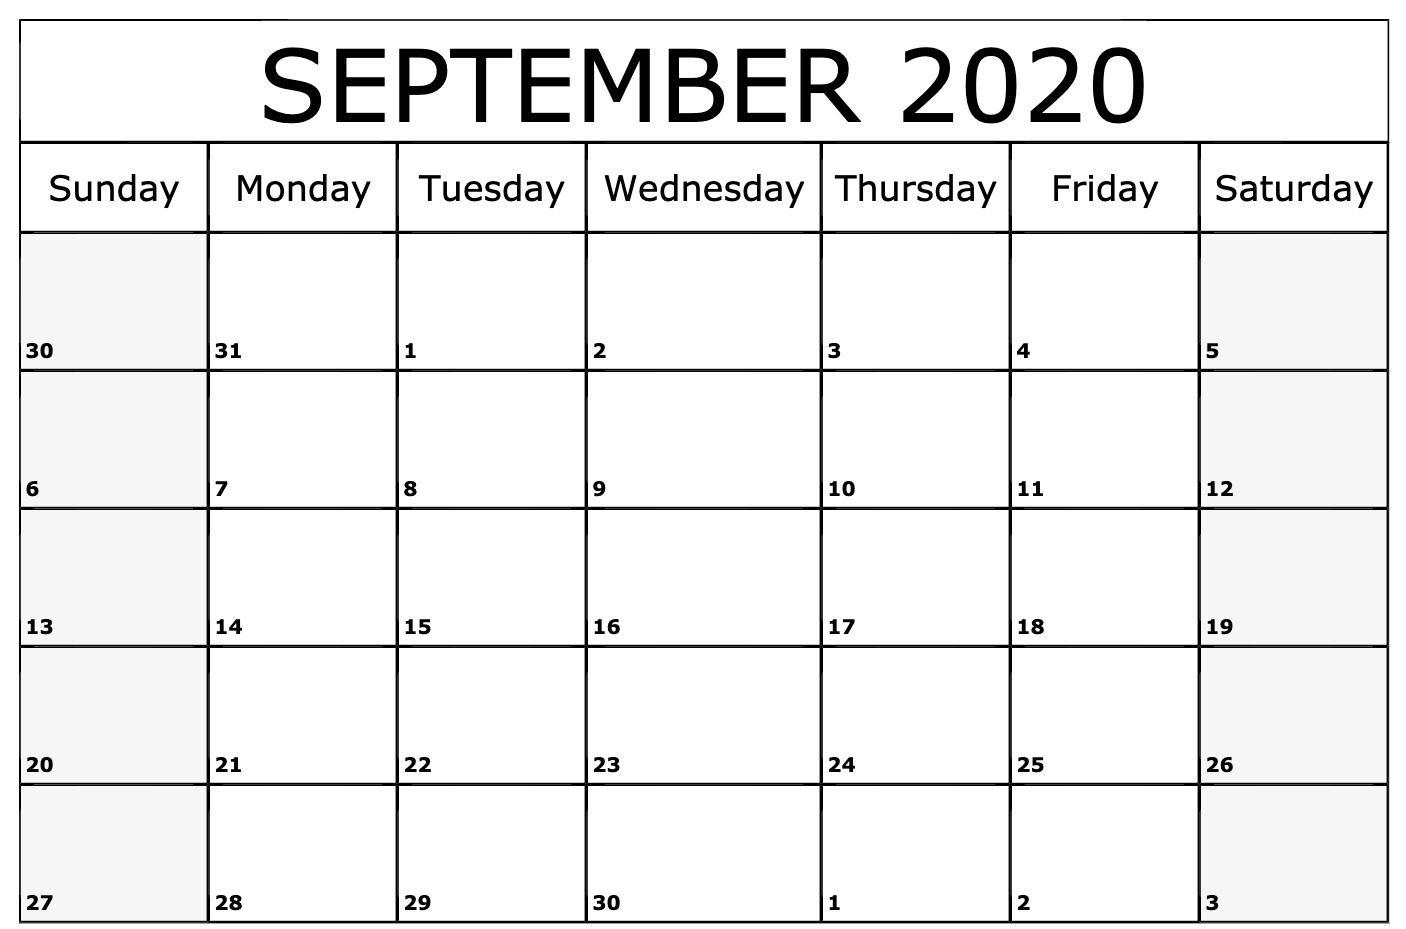 September 2020 Calendar Printable Template | Printable throughout Calendar September 2020 Start Monday Printable Free